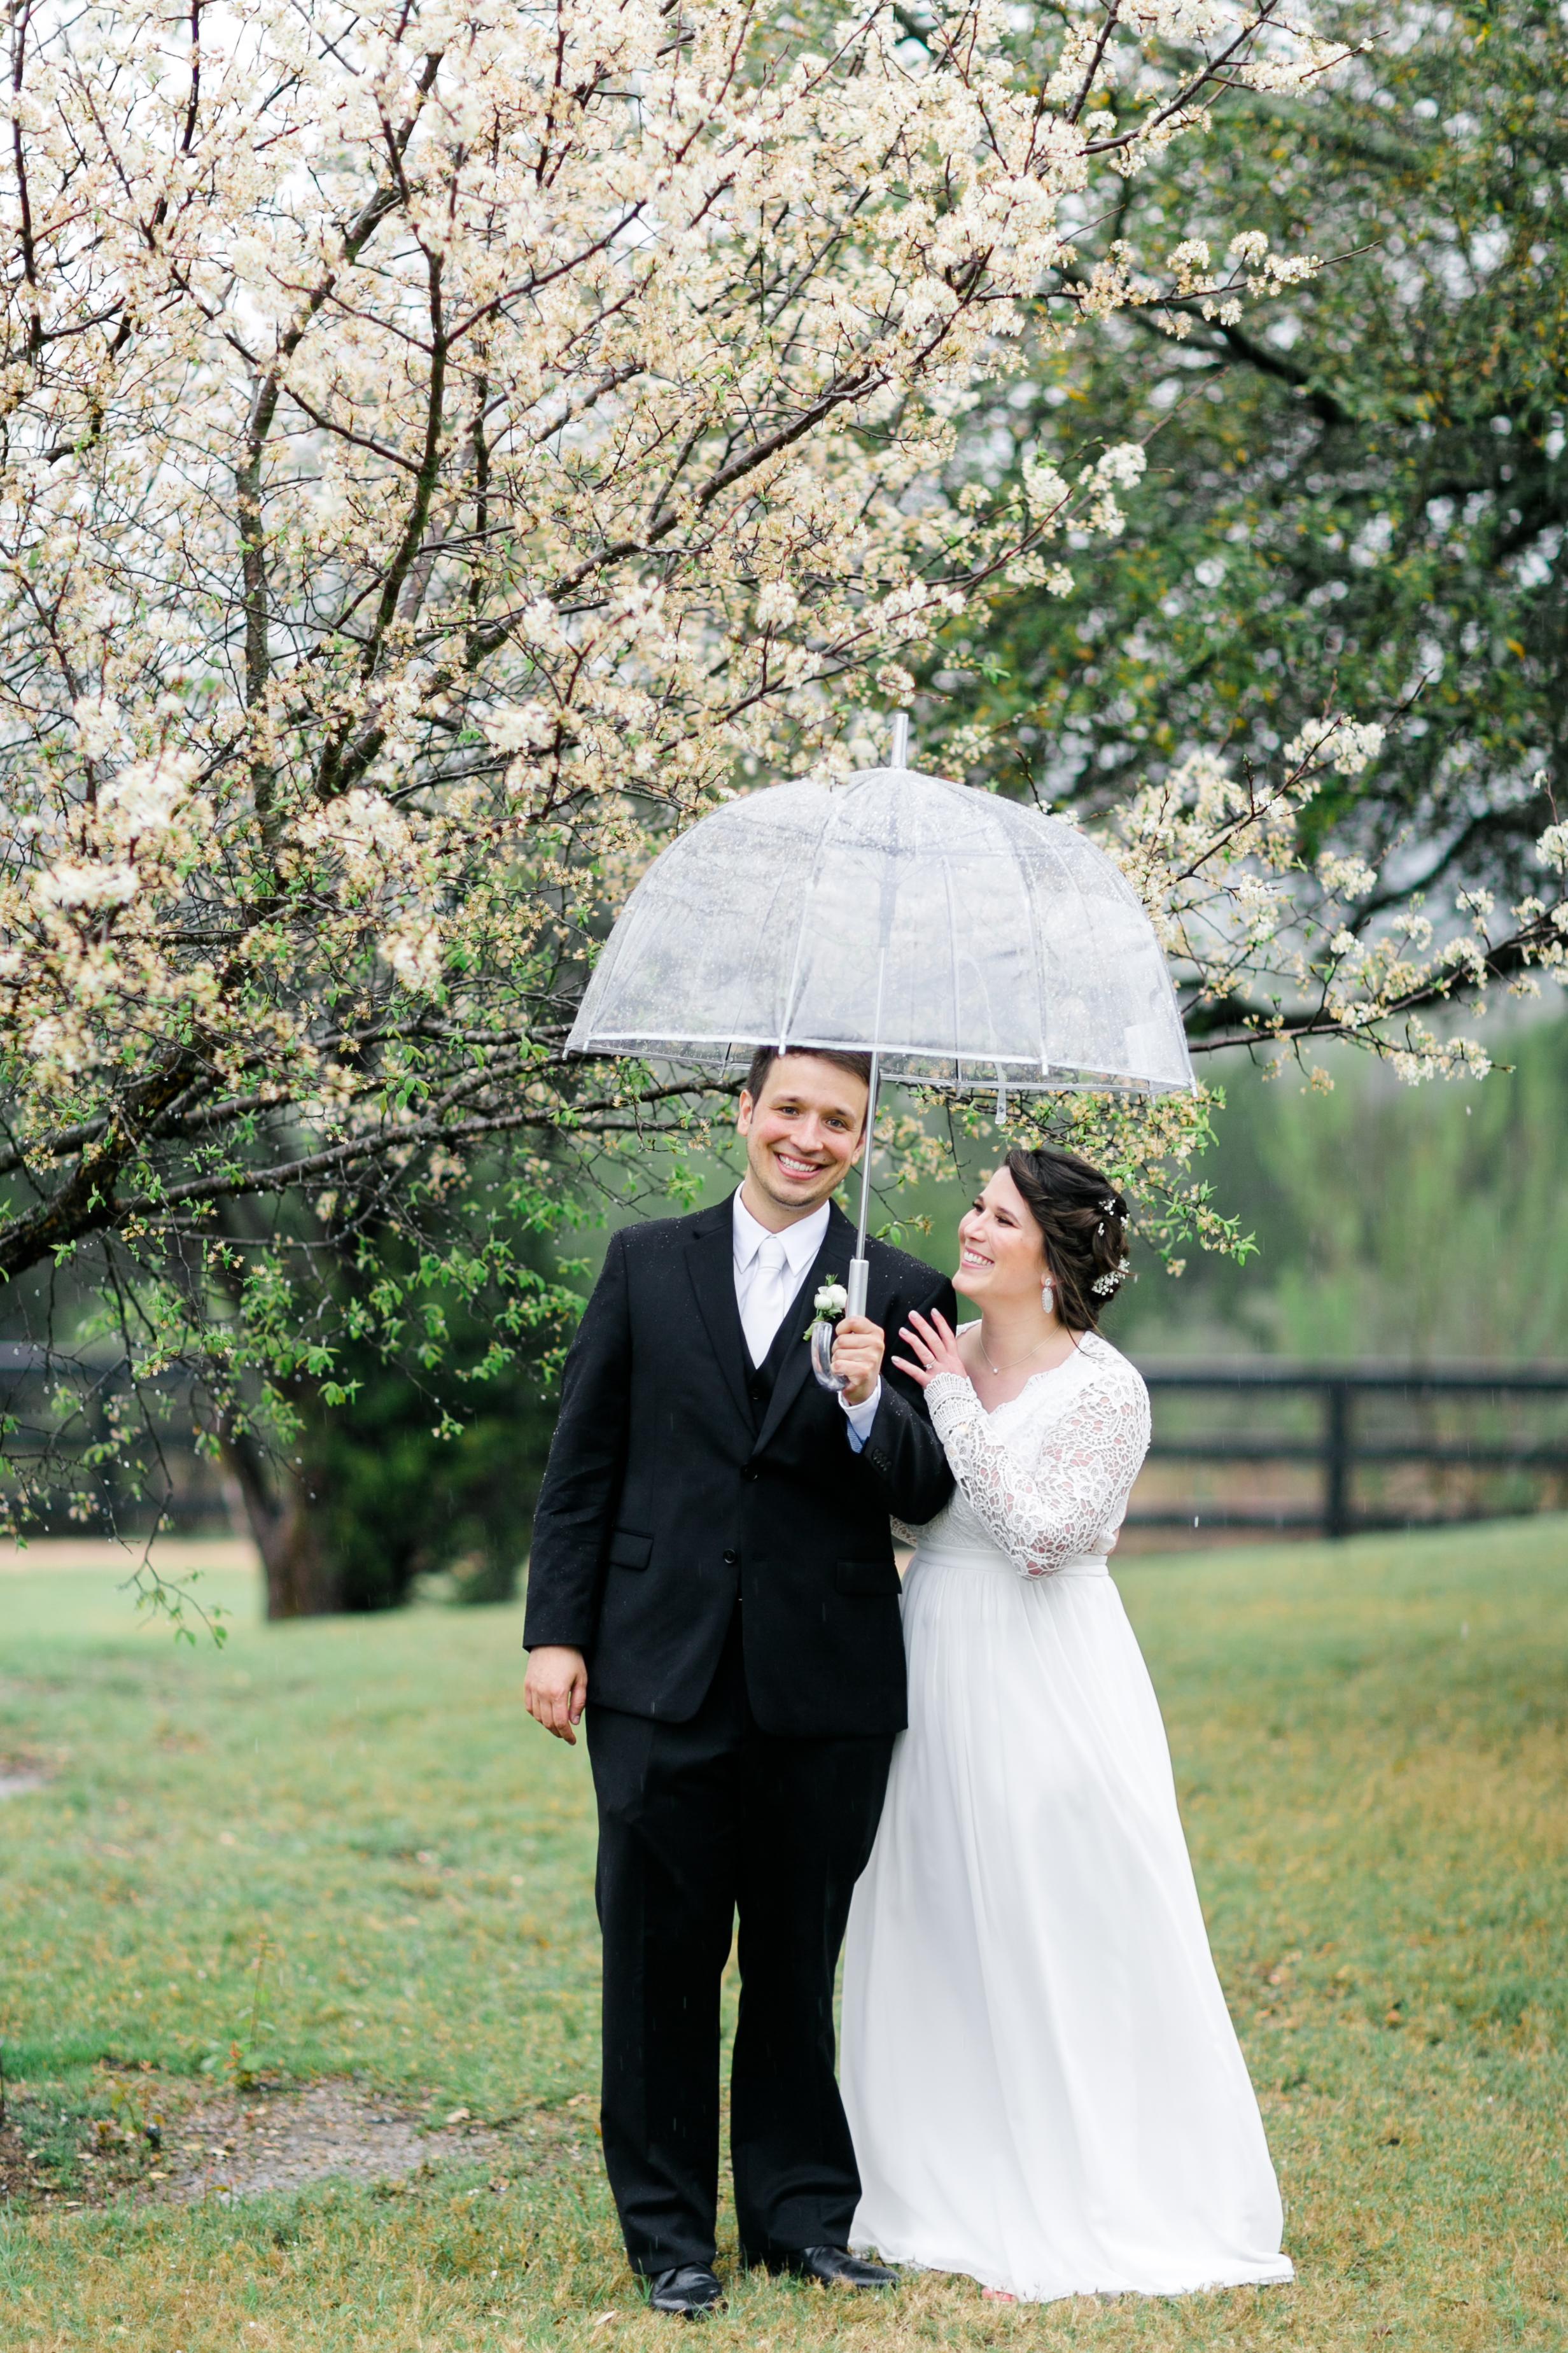 Austin_Texas_Fine_Art_Wedding_Photographer_Kayla_Snell_Photography_Antebellum_Oaks210.jpg